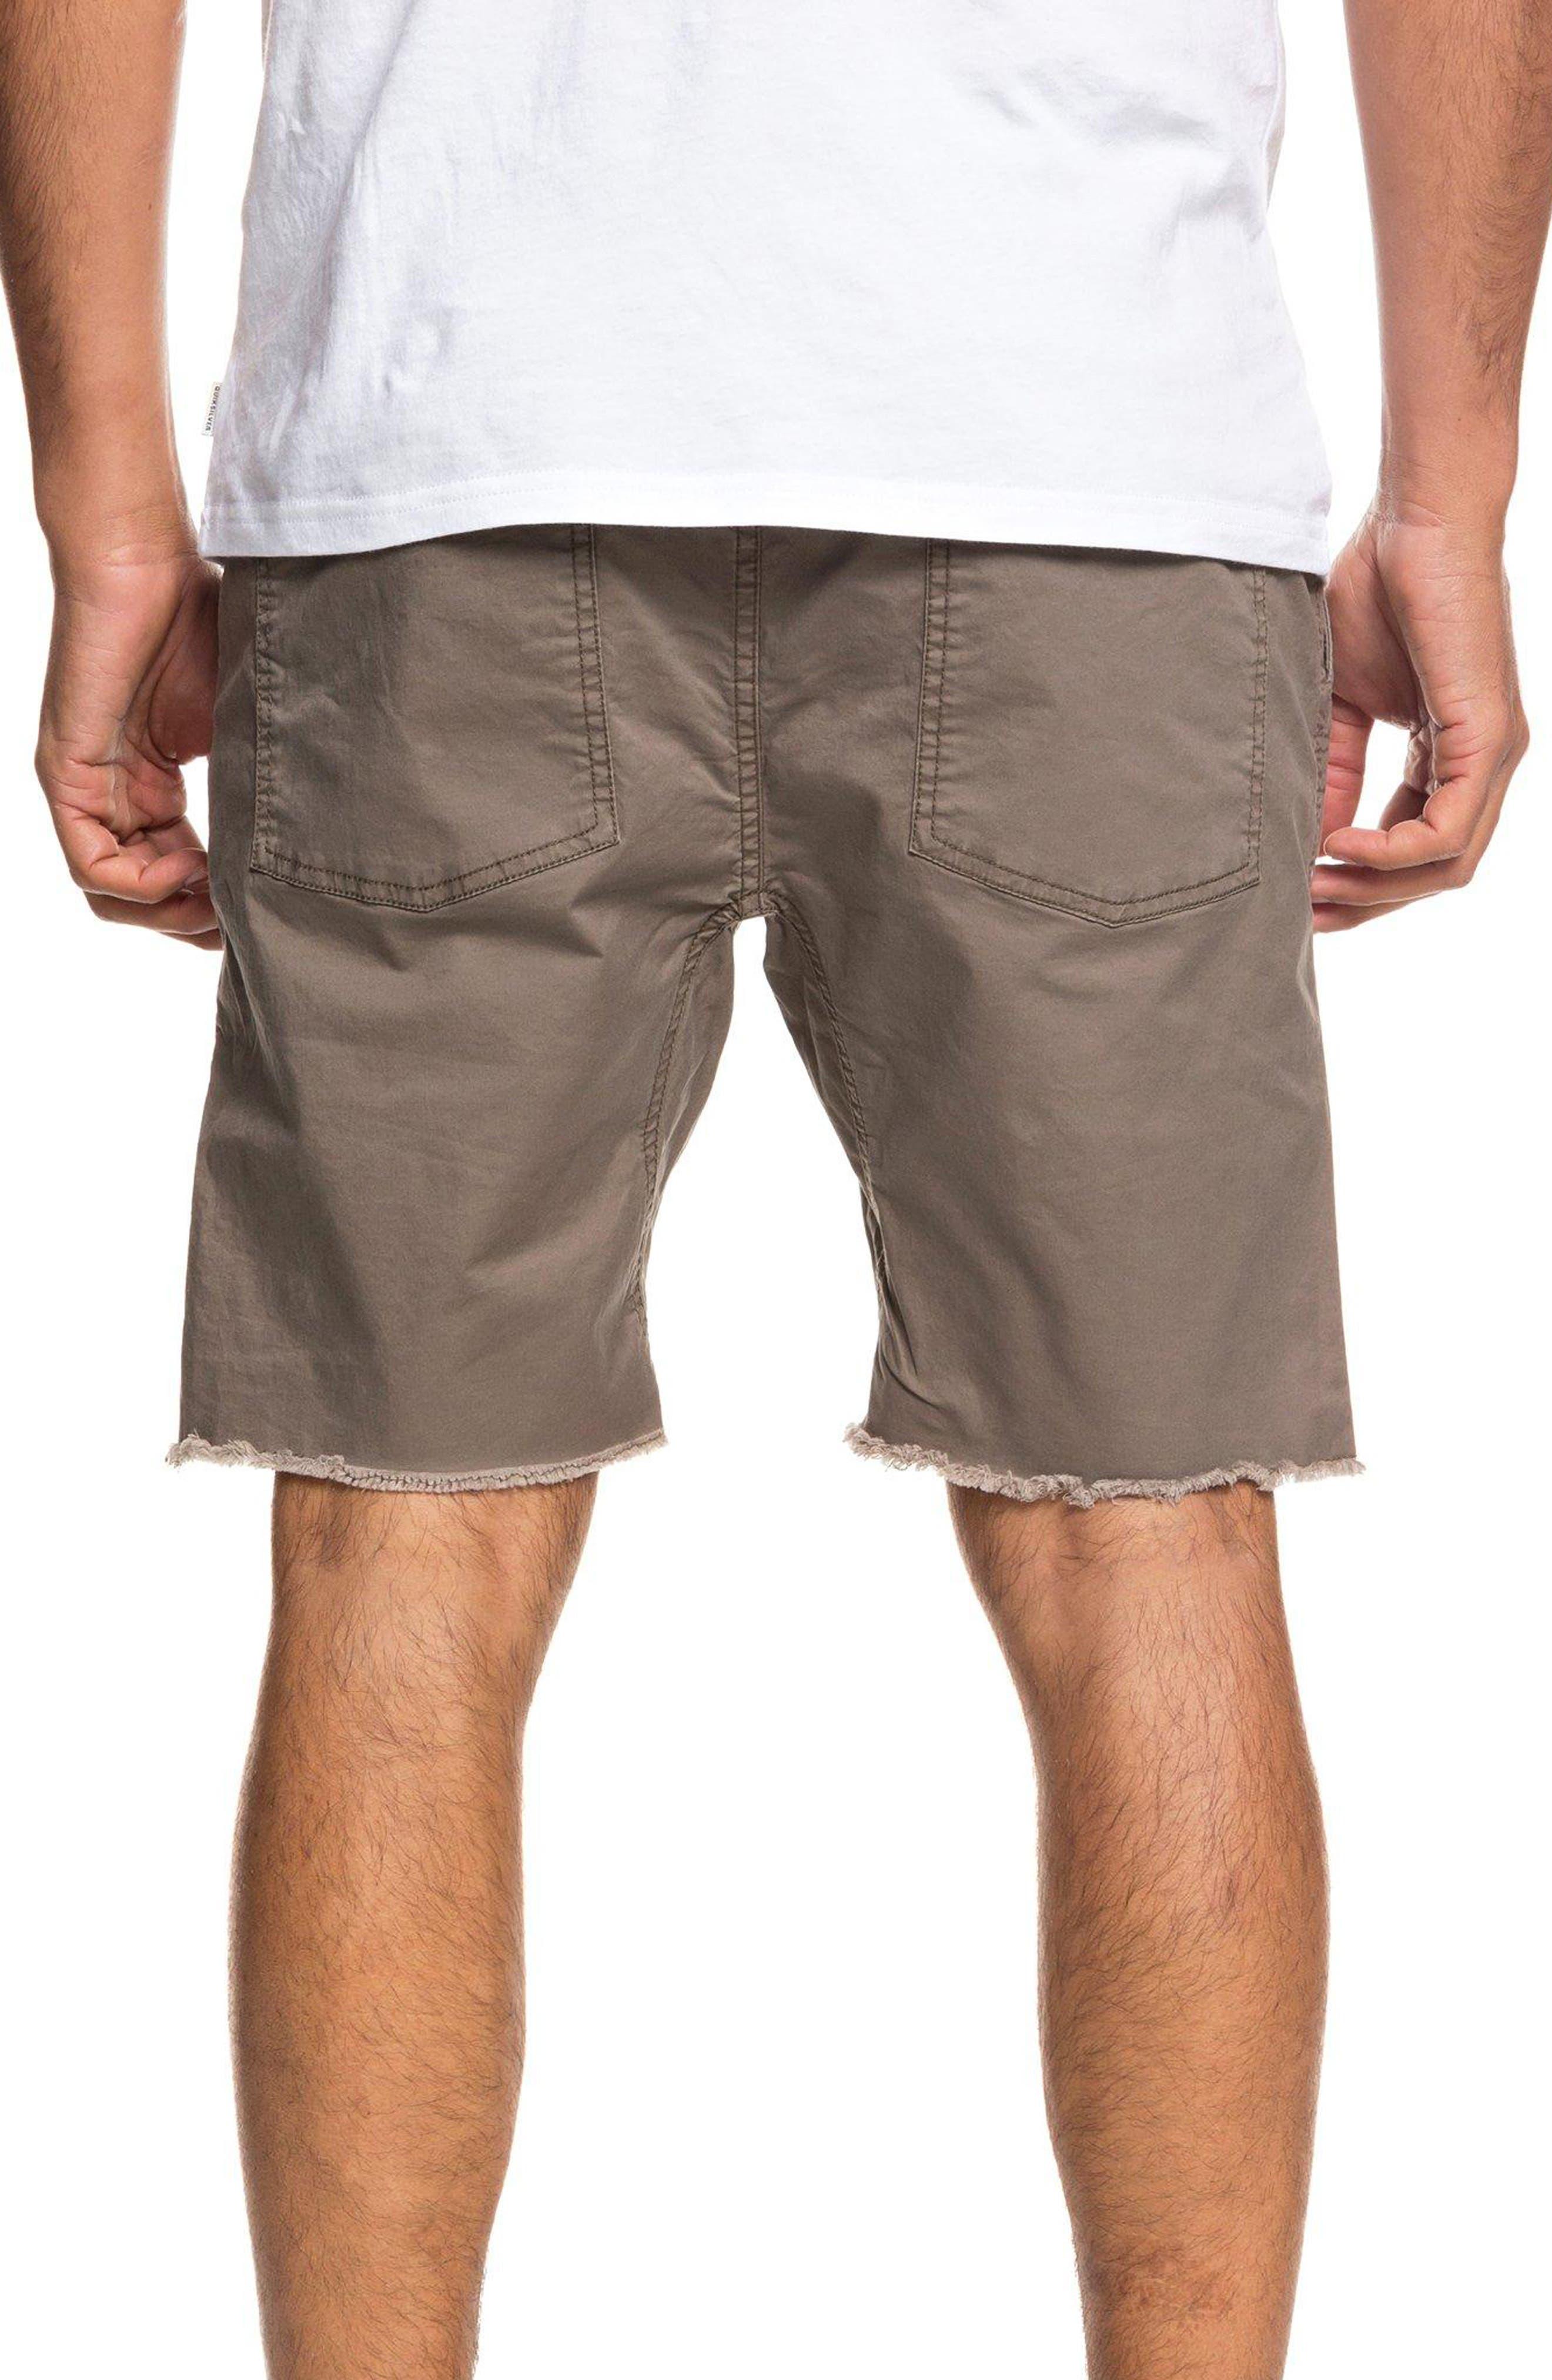 Foxoy Shorts,                             Alternate thumbnail 2, color,                             FALCON